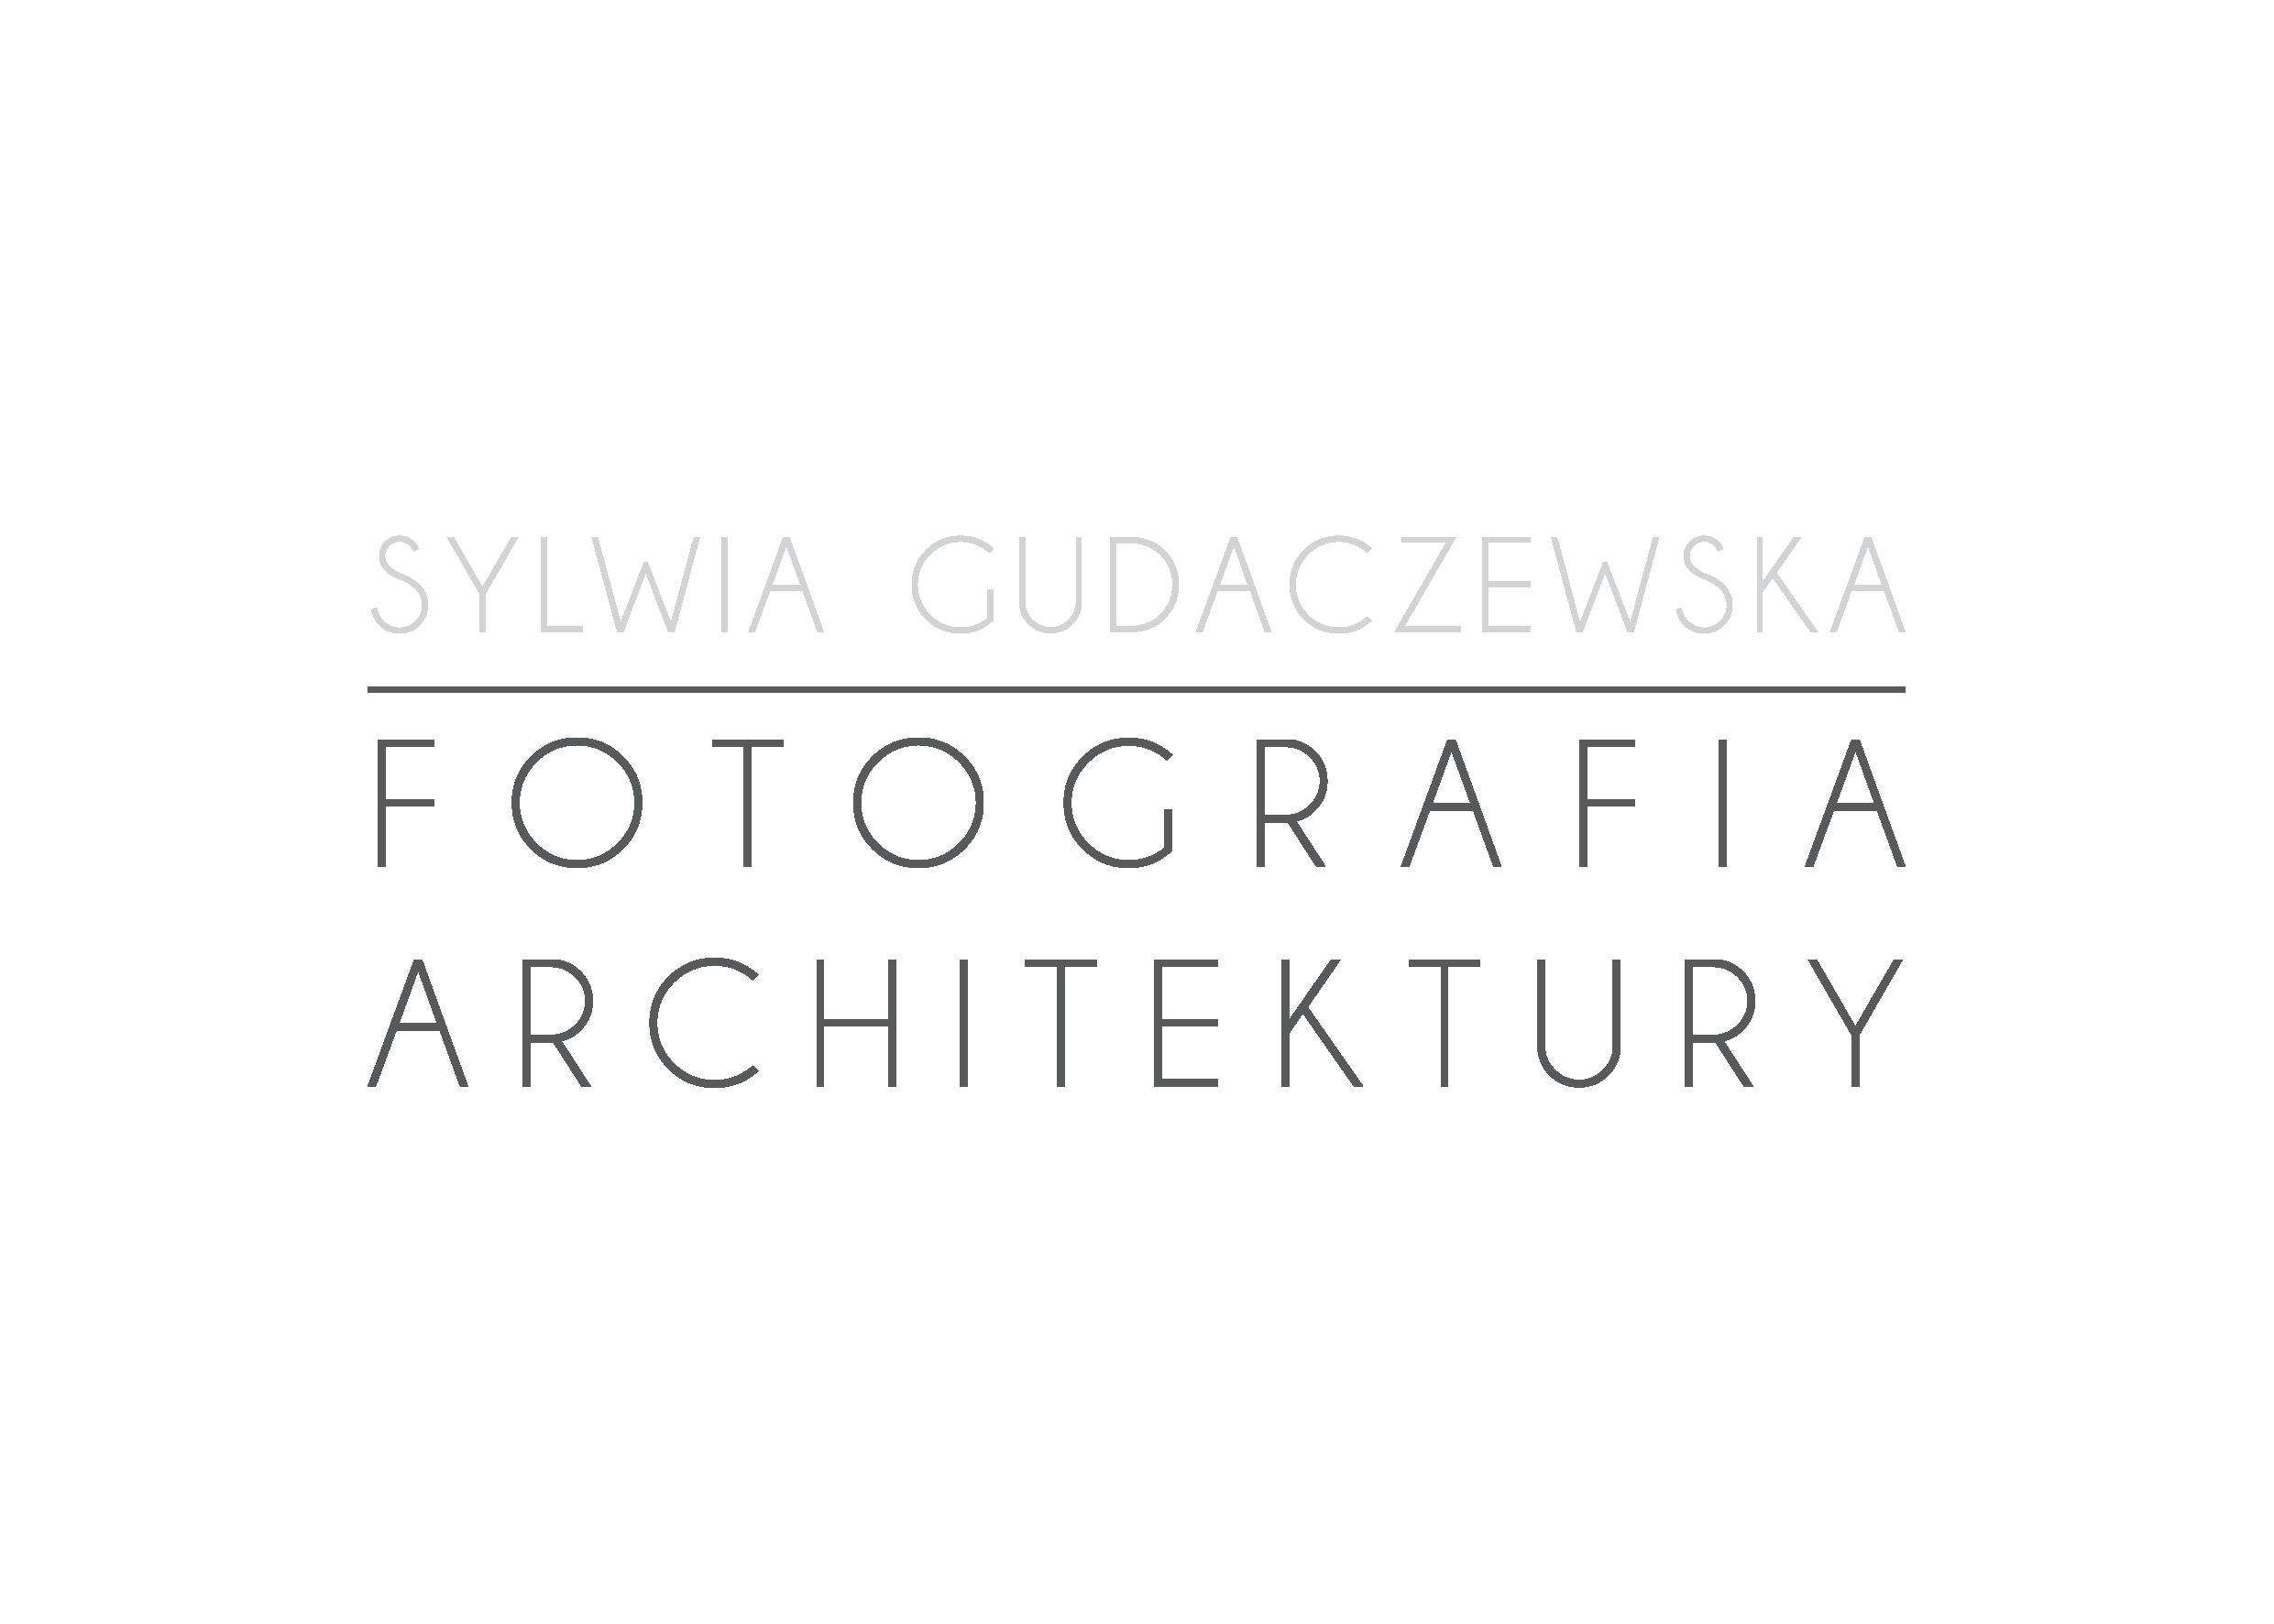 Sylwia Gudaczewska